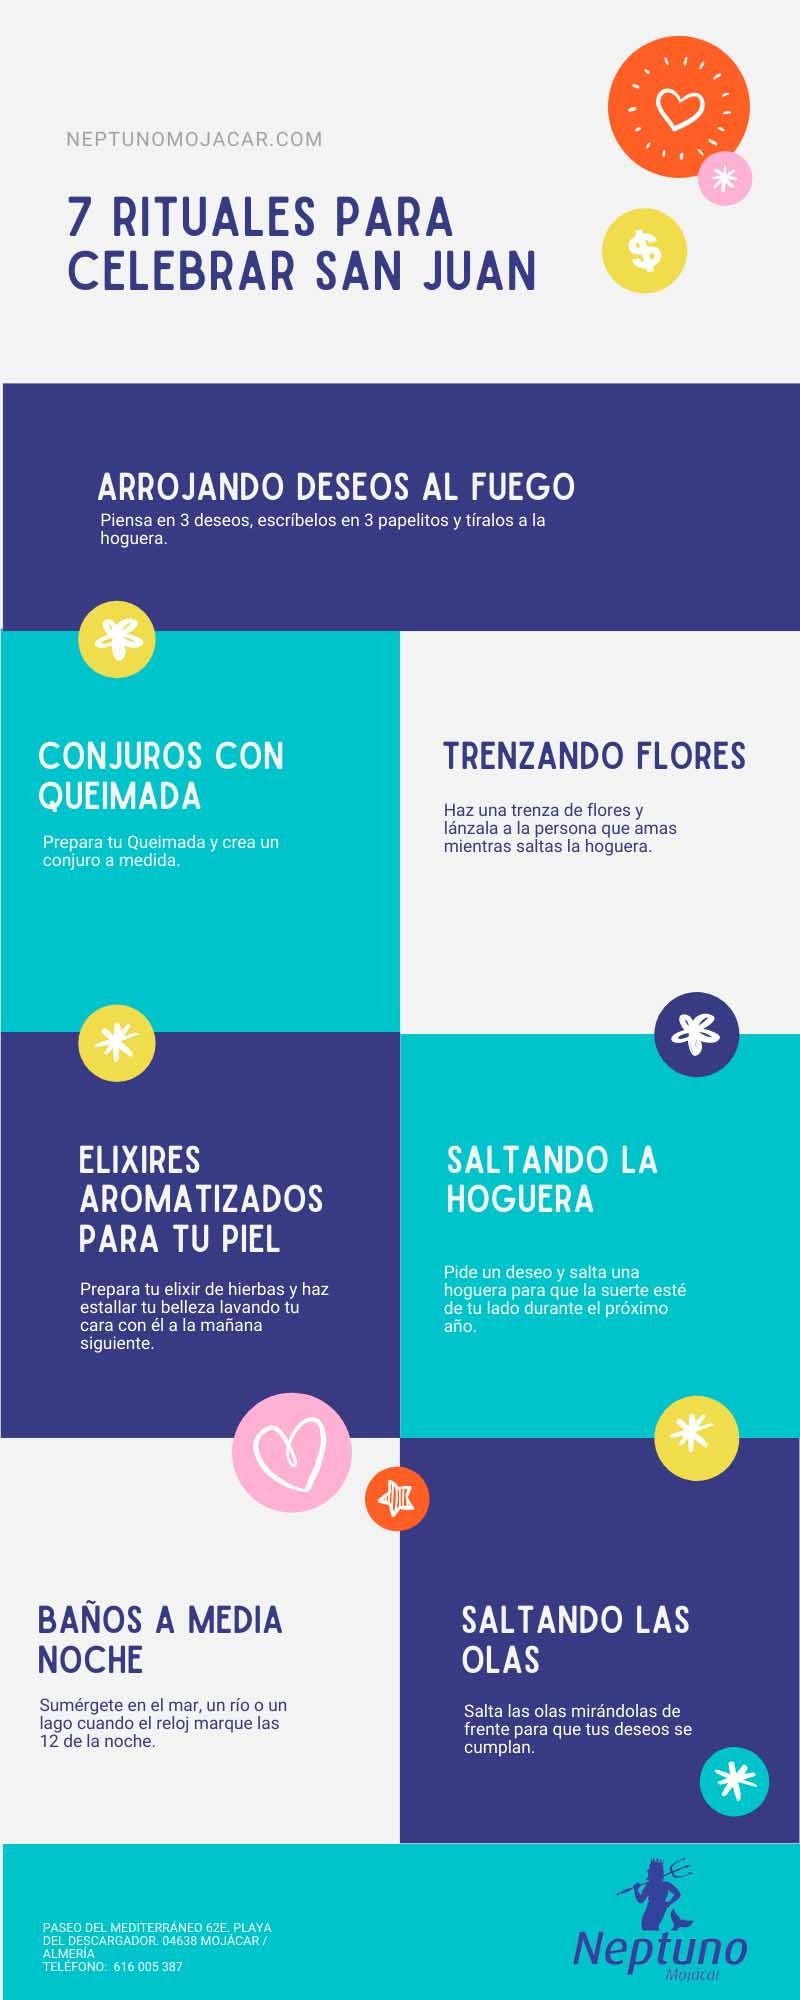 7 RITUALES PARA CELEBRAR San Juan